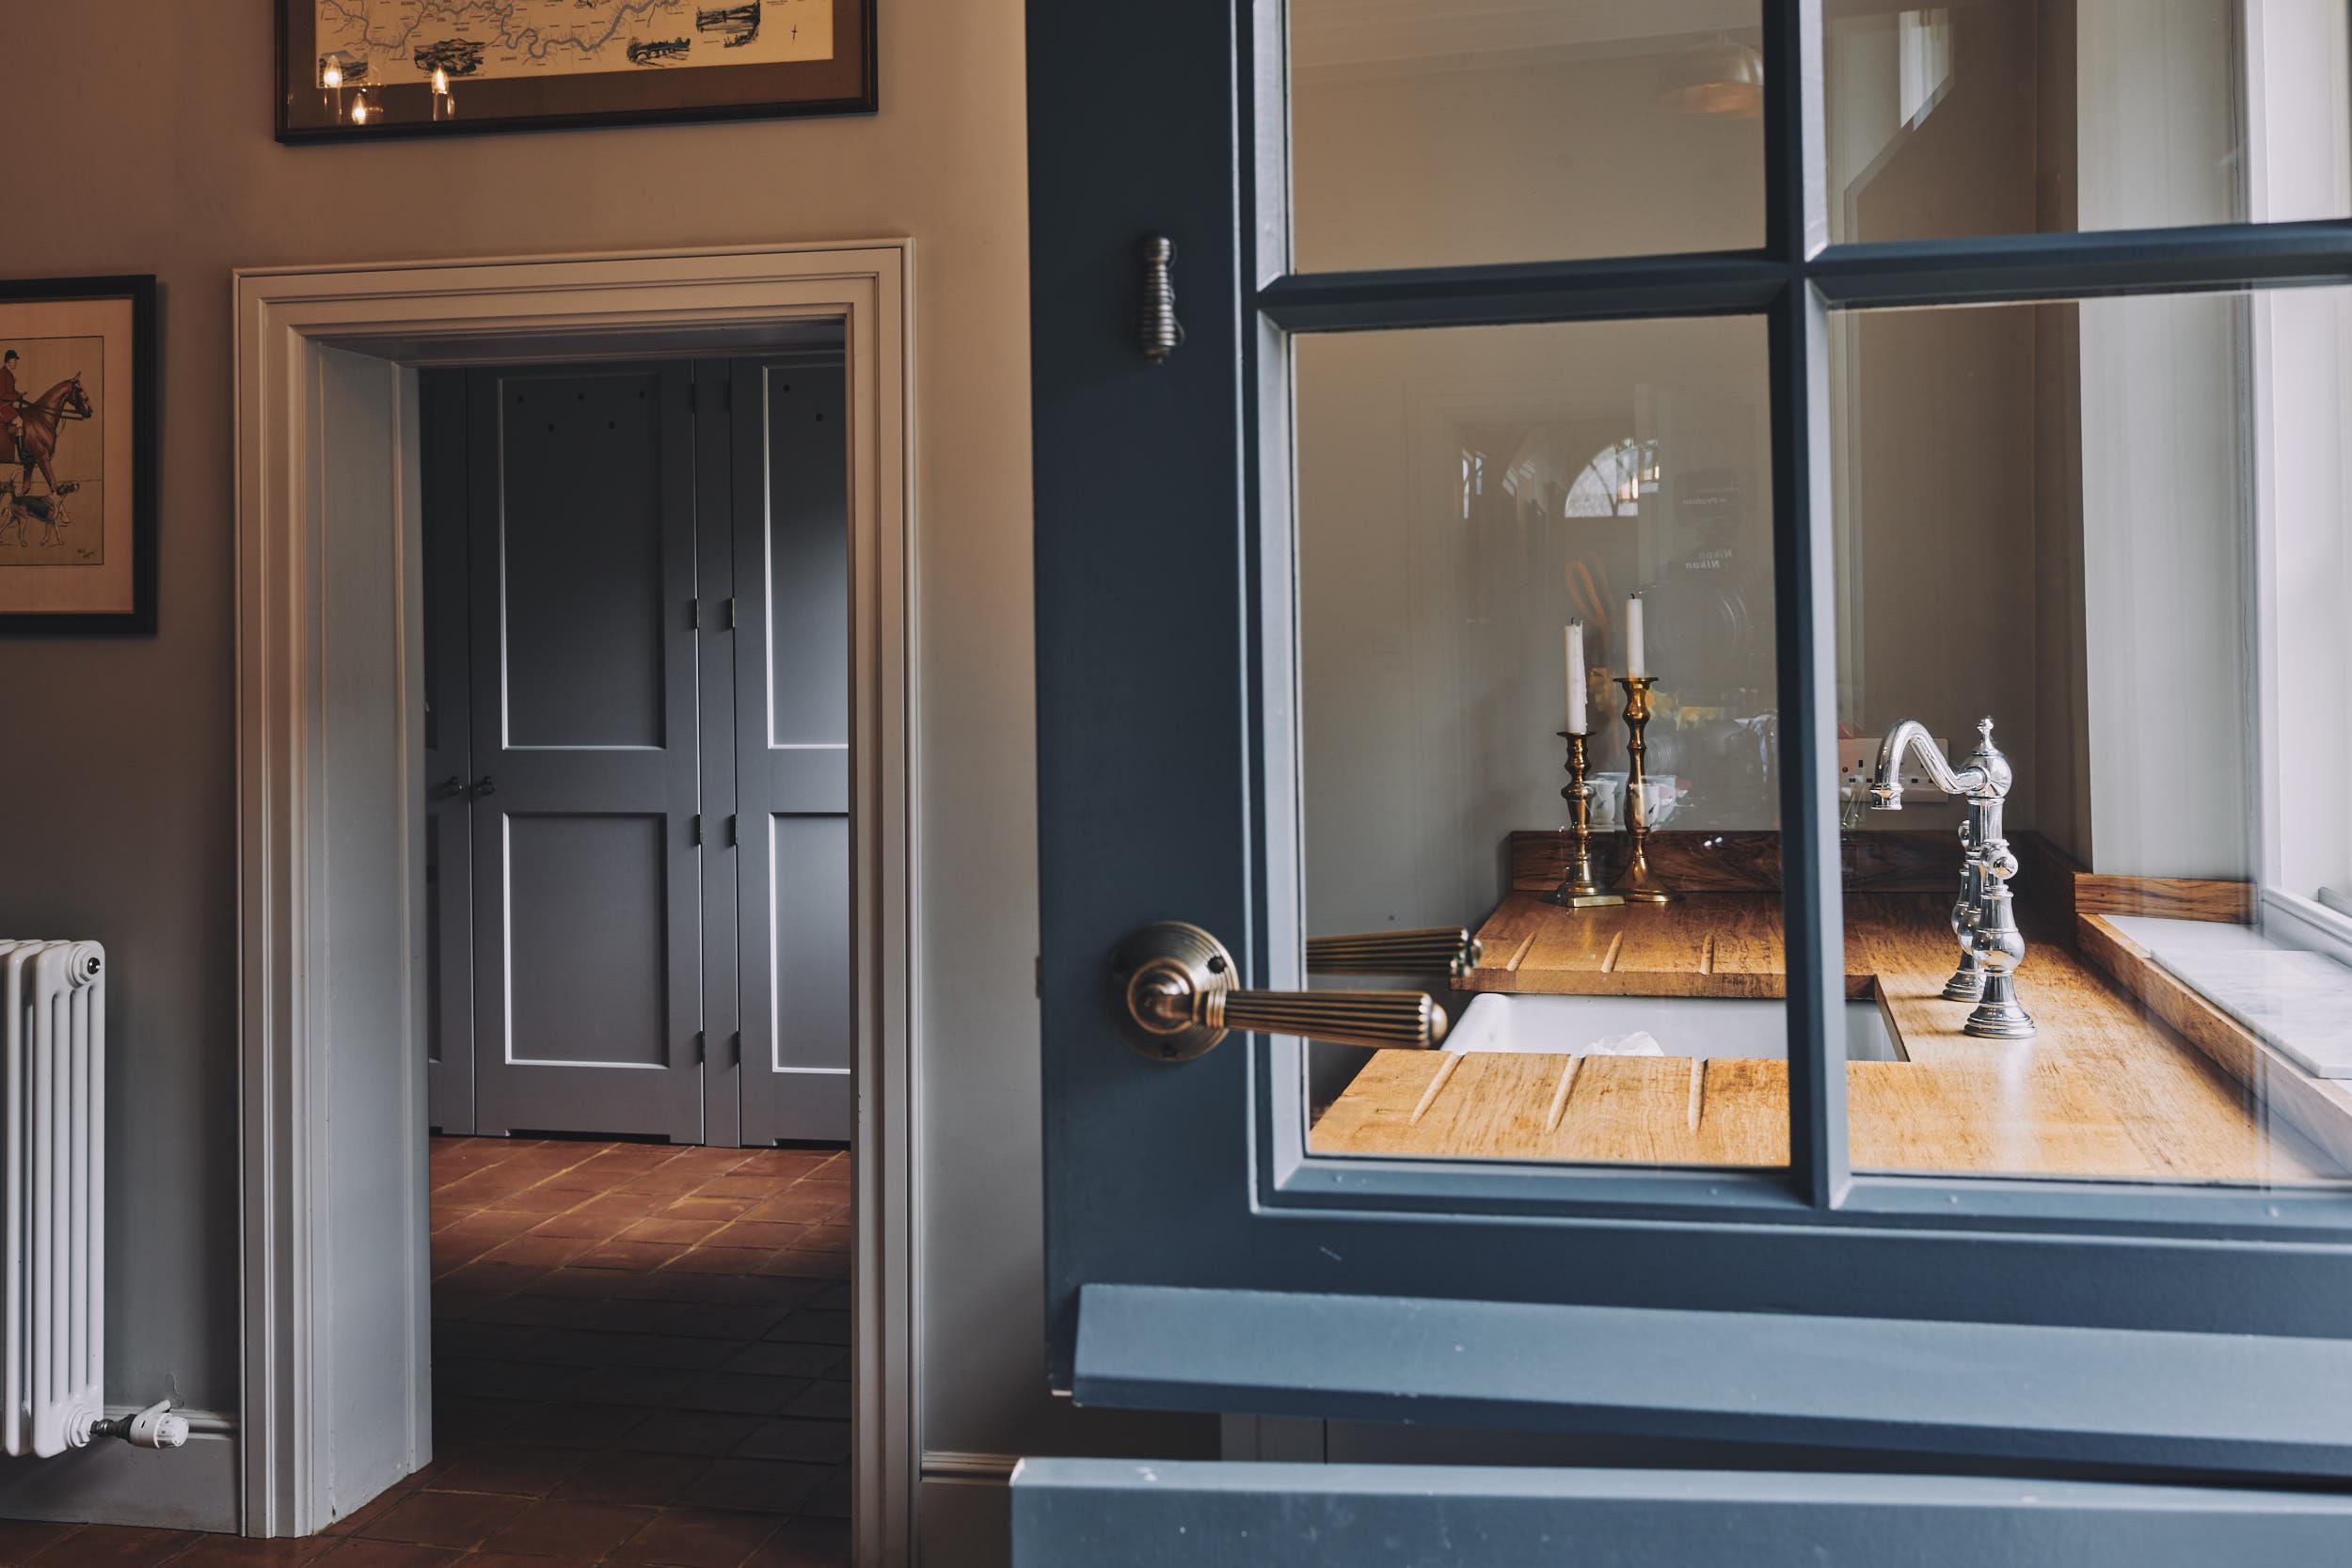 interior photography of luxury bespoke homes by matthew lloyd3161.jpg